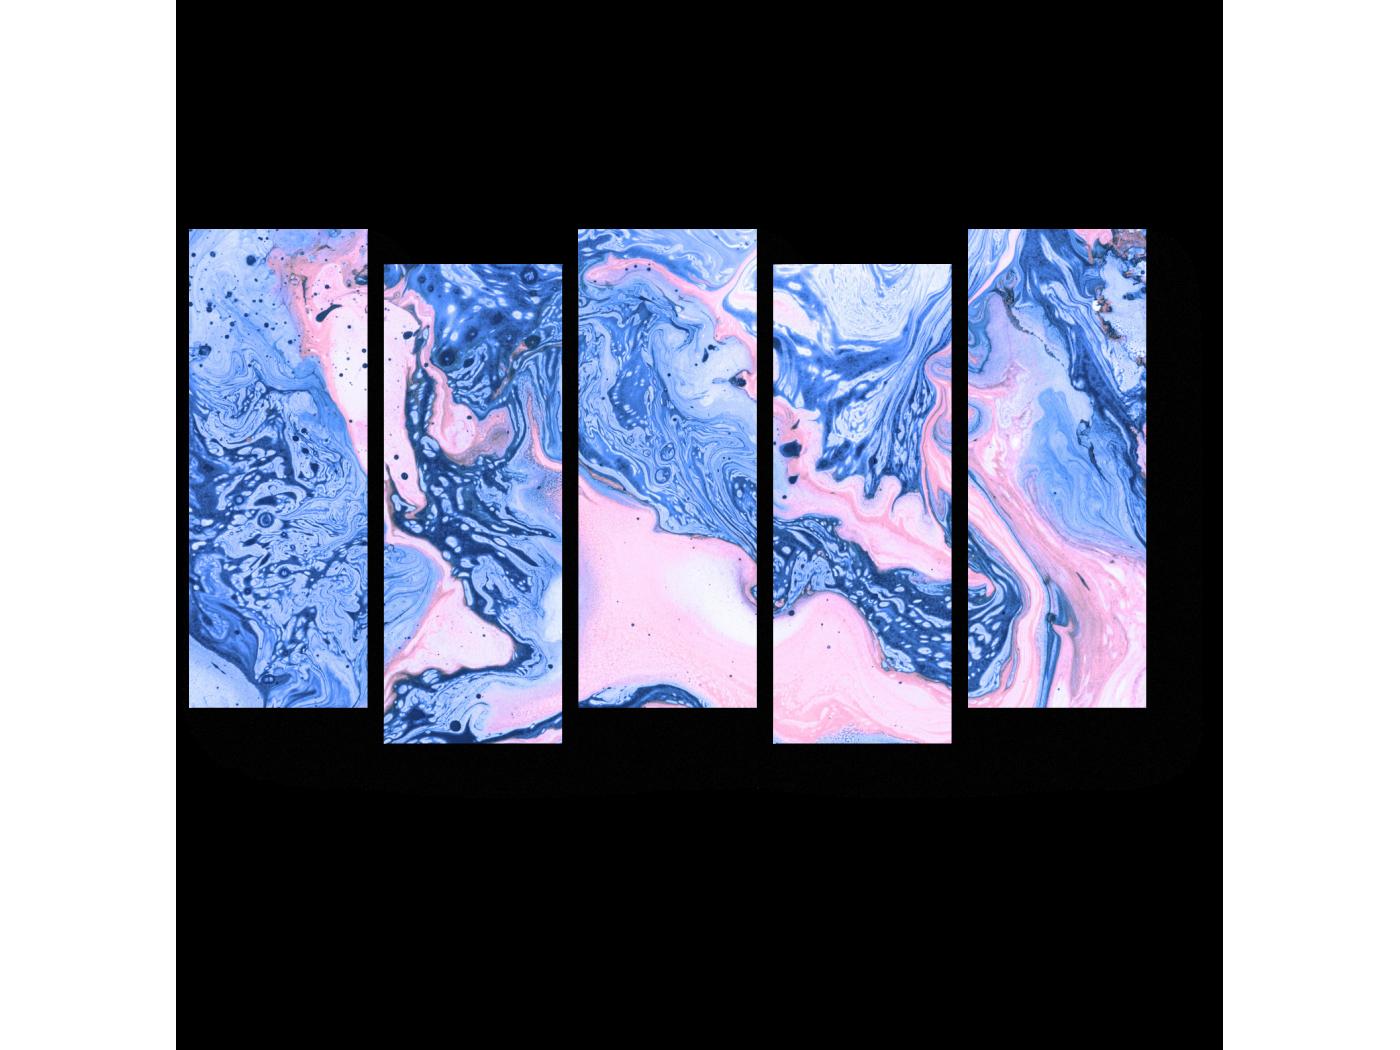 Модульная картина Закат над лазурным морем (90x52) фото